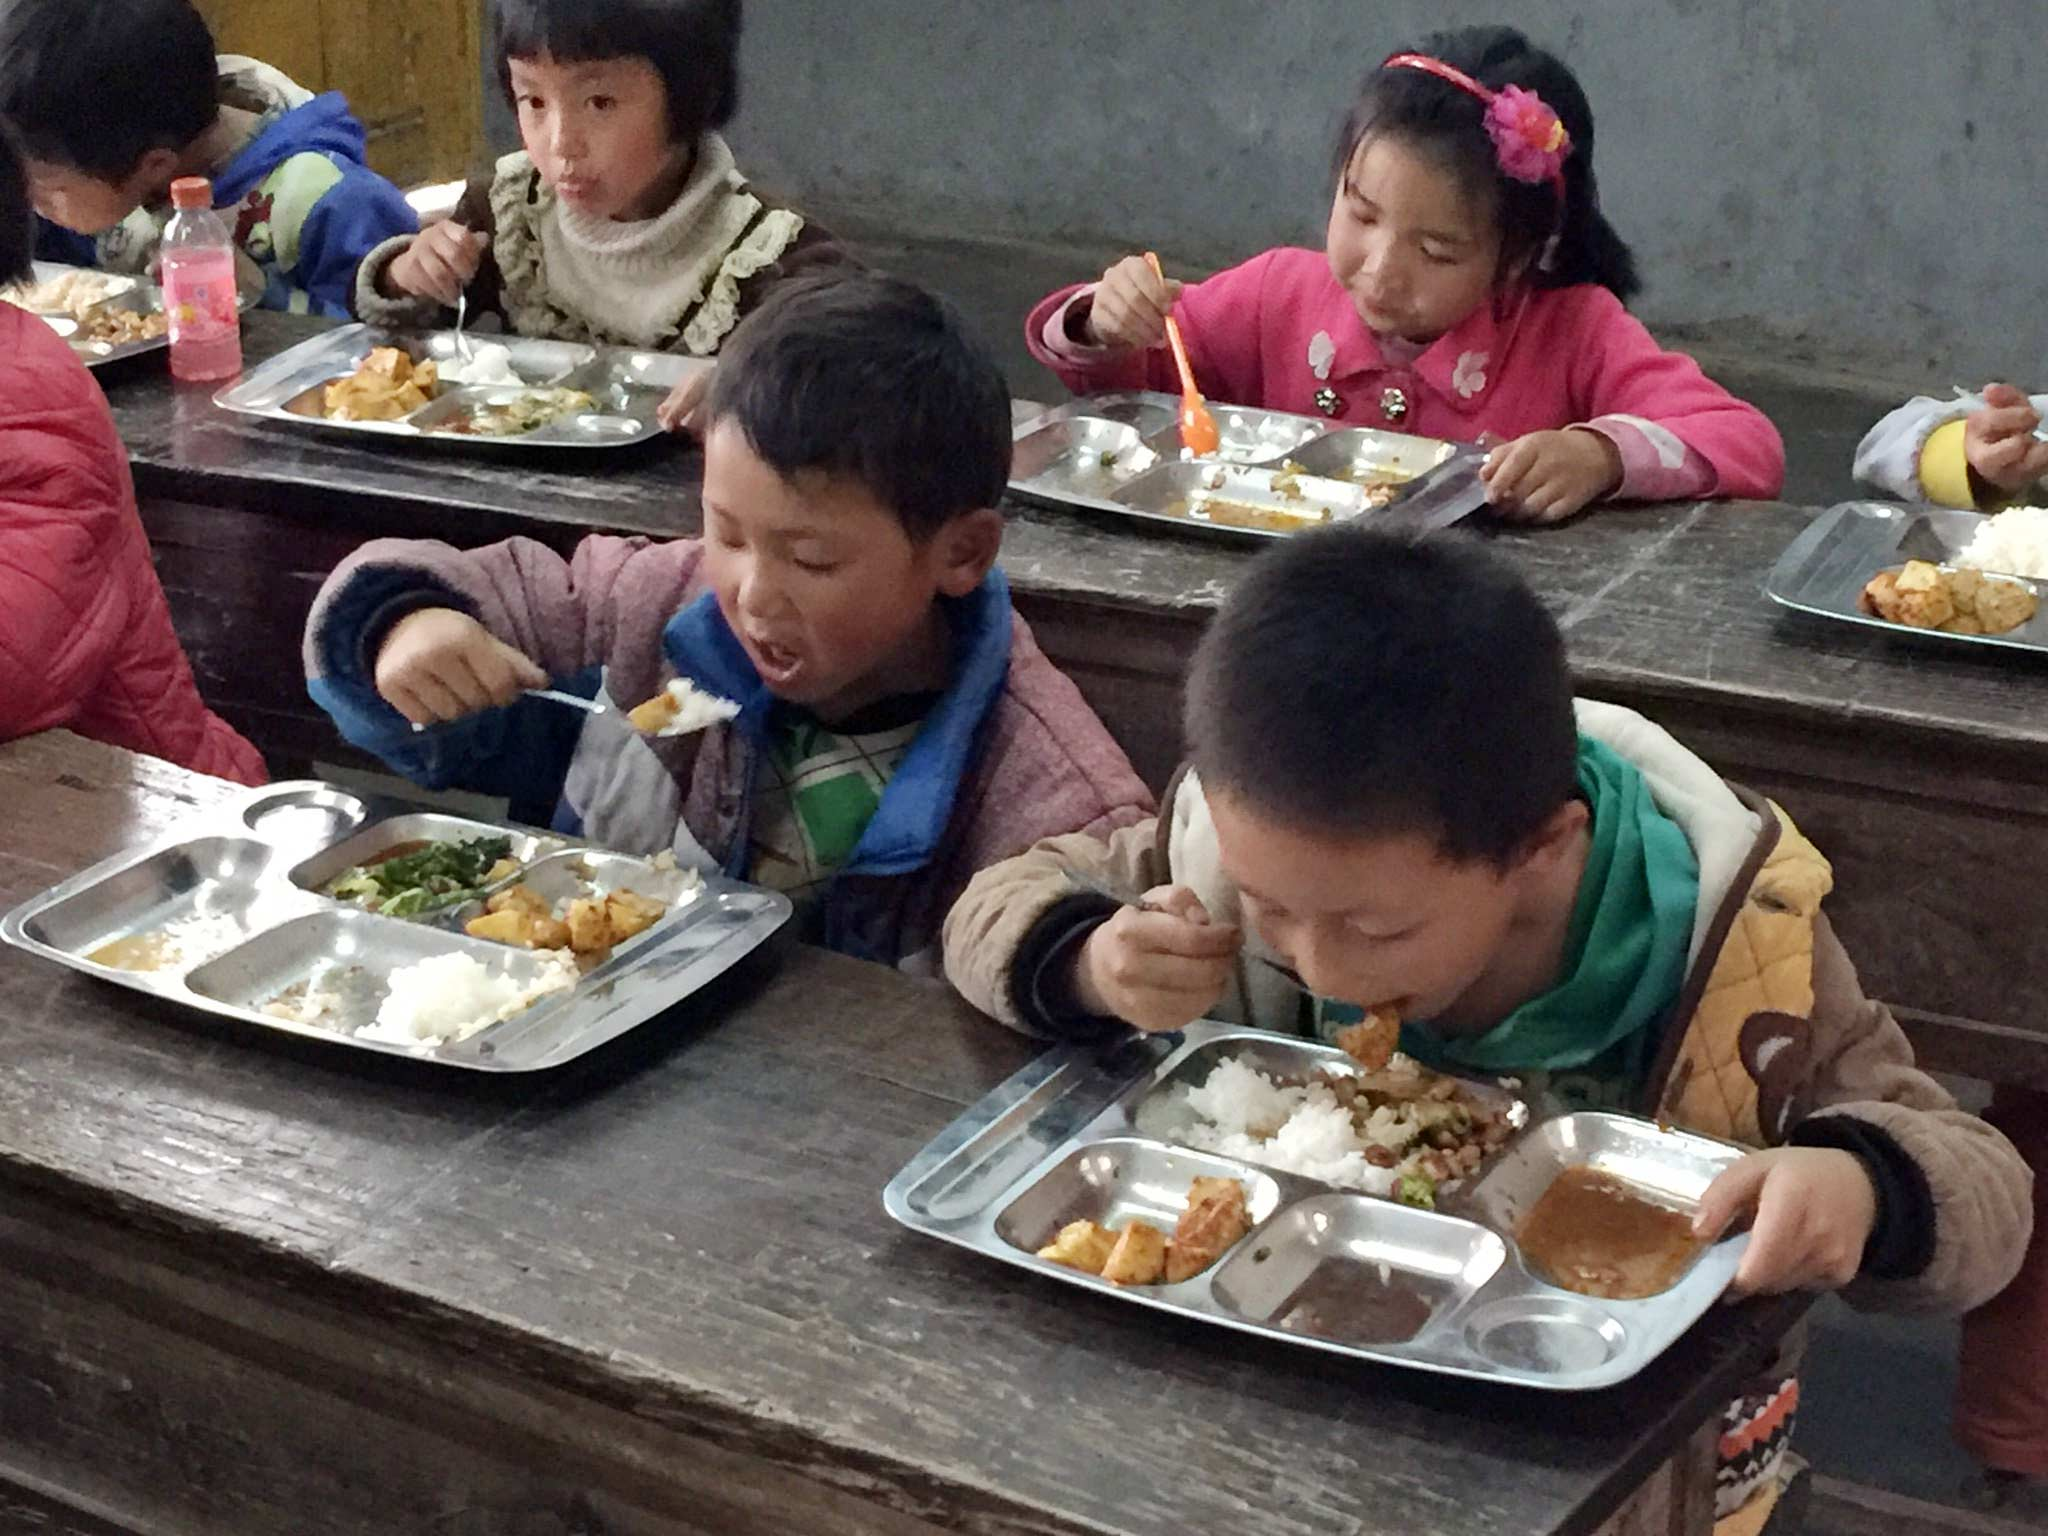 Shuang-He-Cafeteria-1.jpg